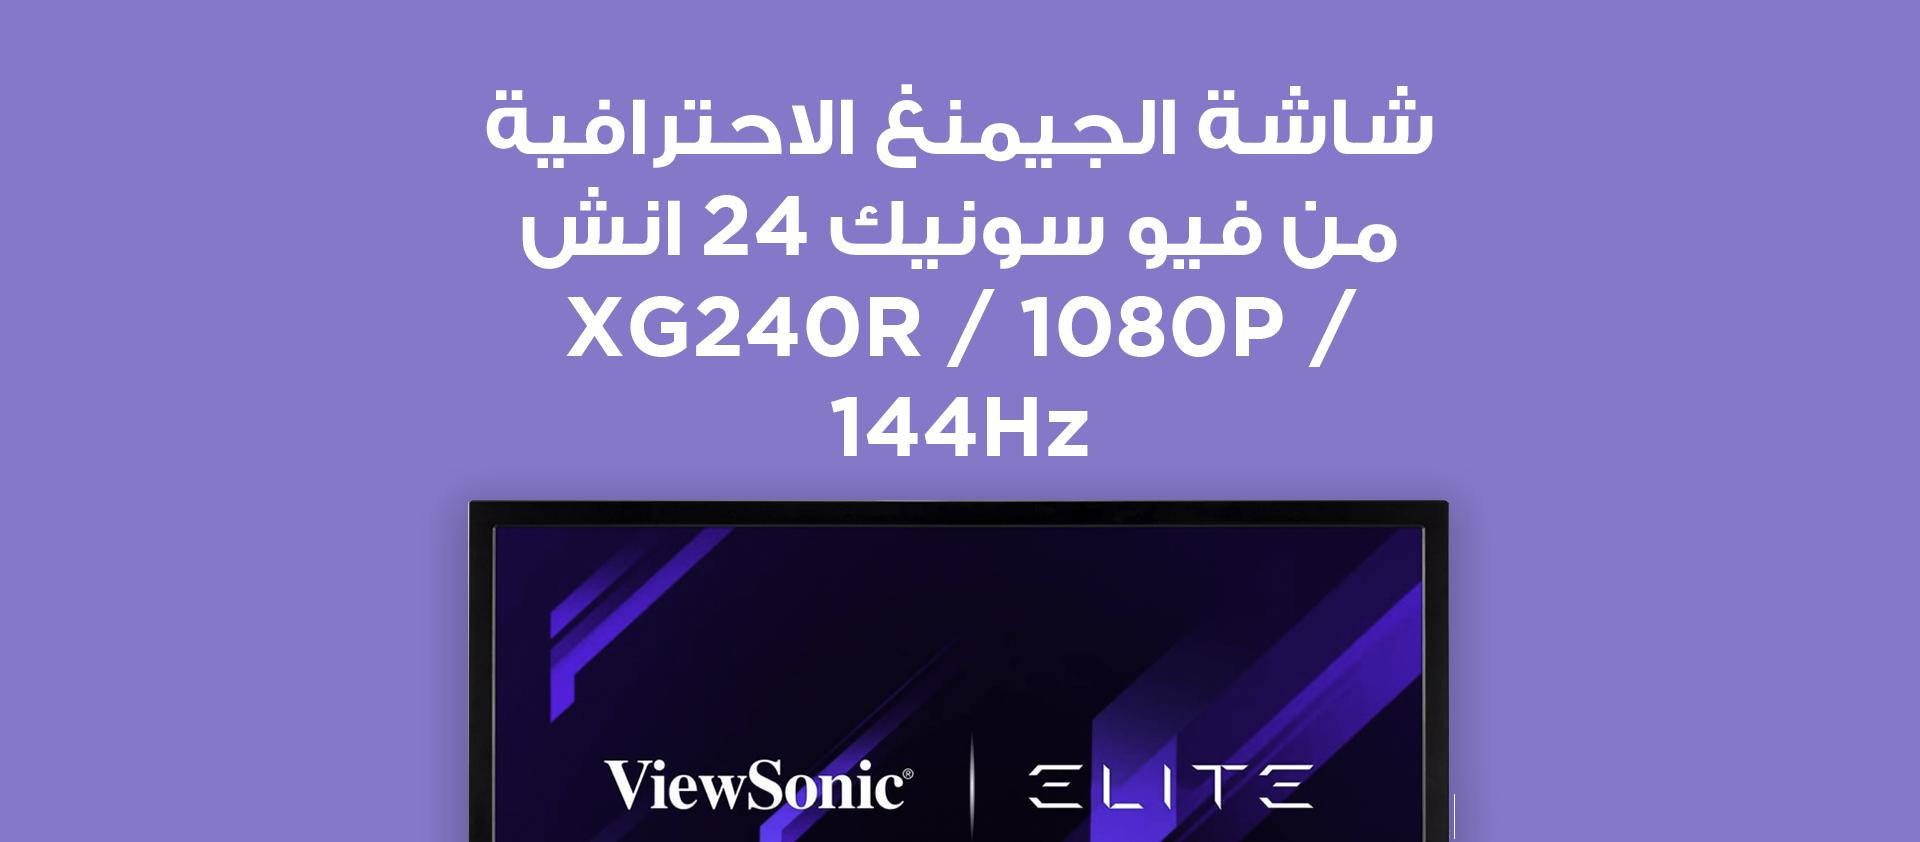 Best e commerce website in qatar